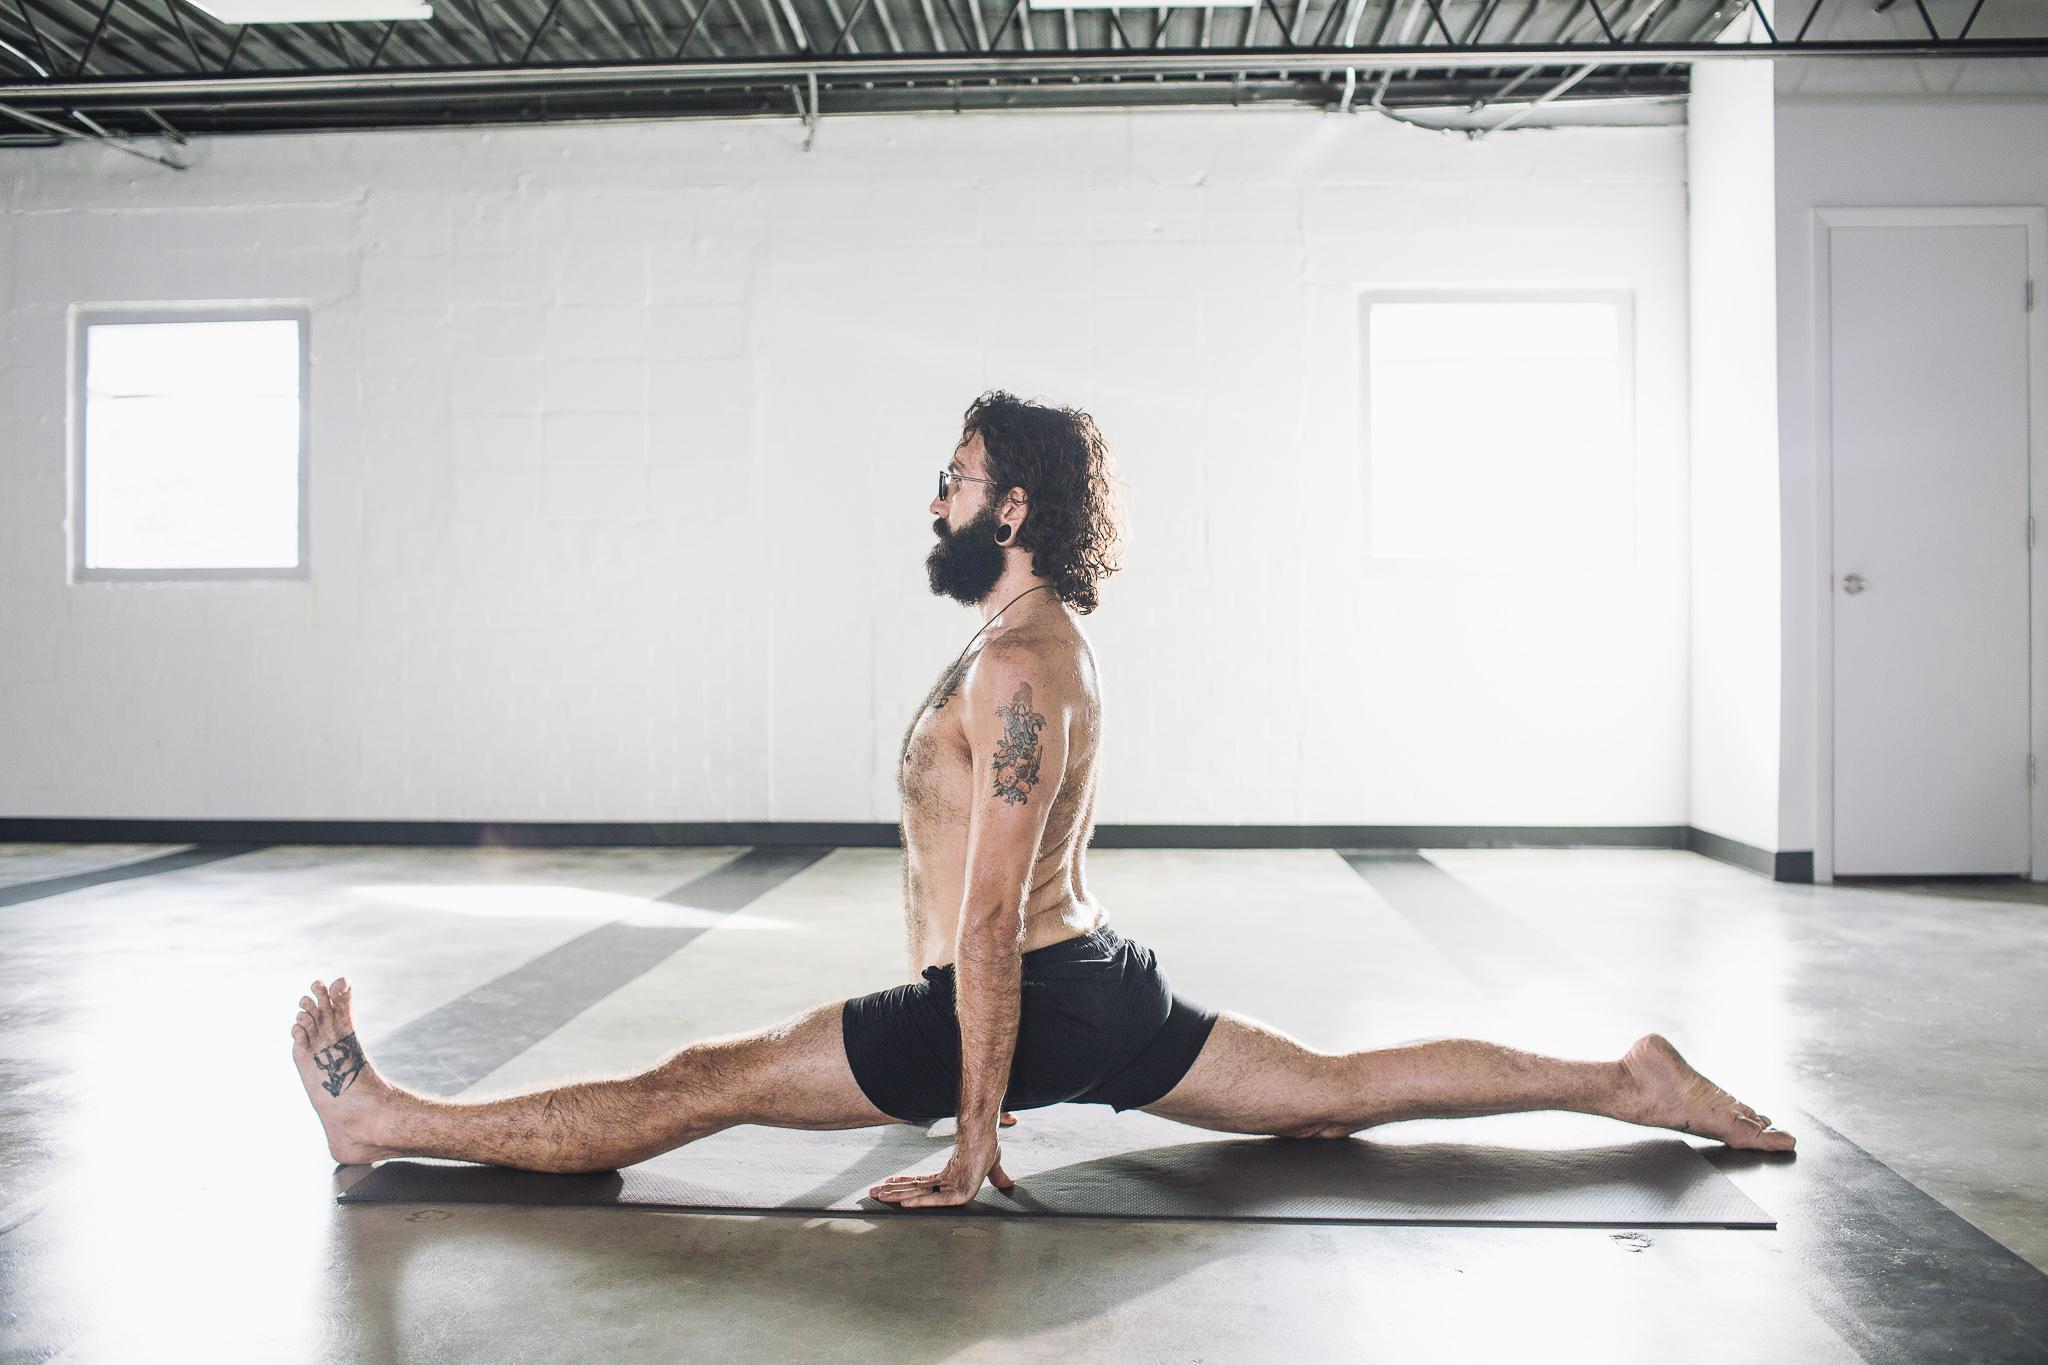 Hot yoga, bikram yoga, 26 and 2, ghosh yoga, bella prana yoga and meditation, yogani yoga, evolation yoga, tampa bay, kodawari, sattva yoga, zoe yoga lifestyle, lucky cat yoga, ganesha hot yoga, the body electric yoga company, moving meditations, Jai dee yoga, pose by pose yoga, gaze hot yoga, gaze yoga, tampa heights, Seminole heights, riverside heights, ybor city, massage, body work tampa, massage envy tampa, craniosacral therapy, upledger institute, thai massage, sen lines, Lucky cat yoga studio, lucky cat YTT, Eric and Erin Wheeler, Esak Garcia, Ida jo and Scott Lamps, Kolkata, Calcuta